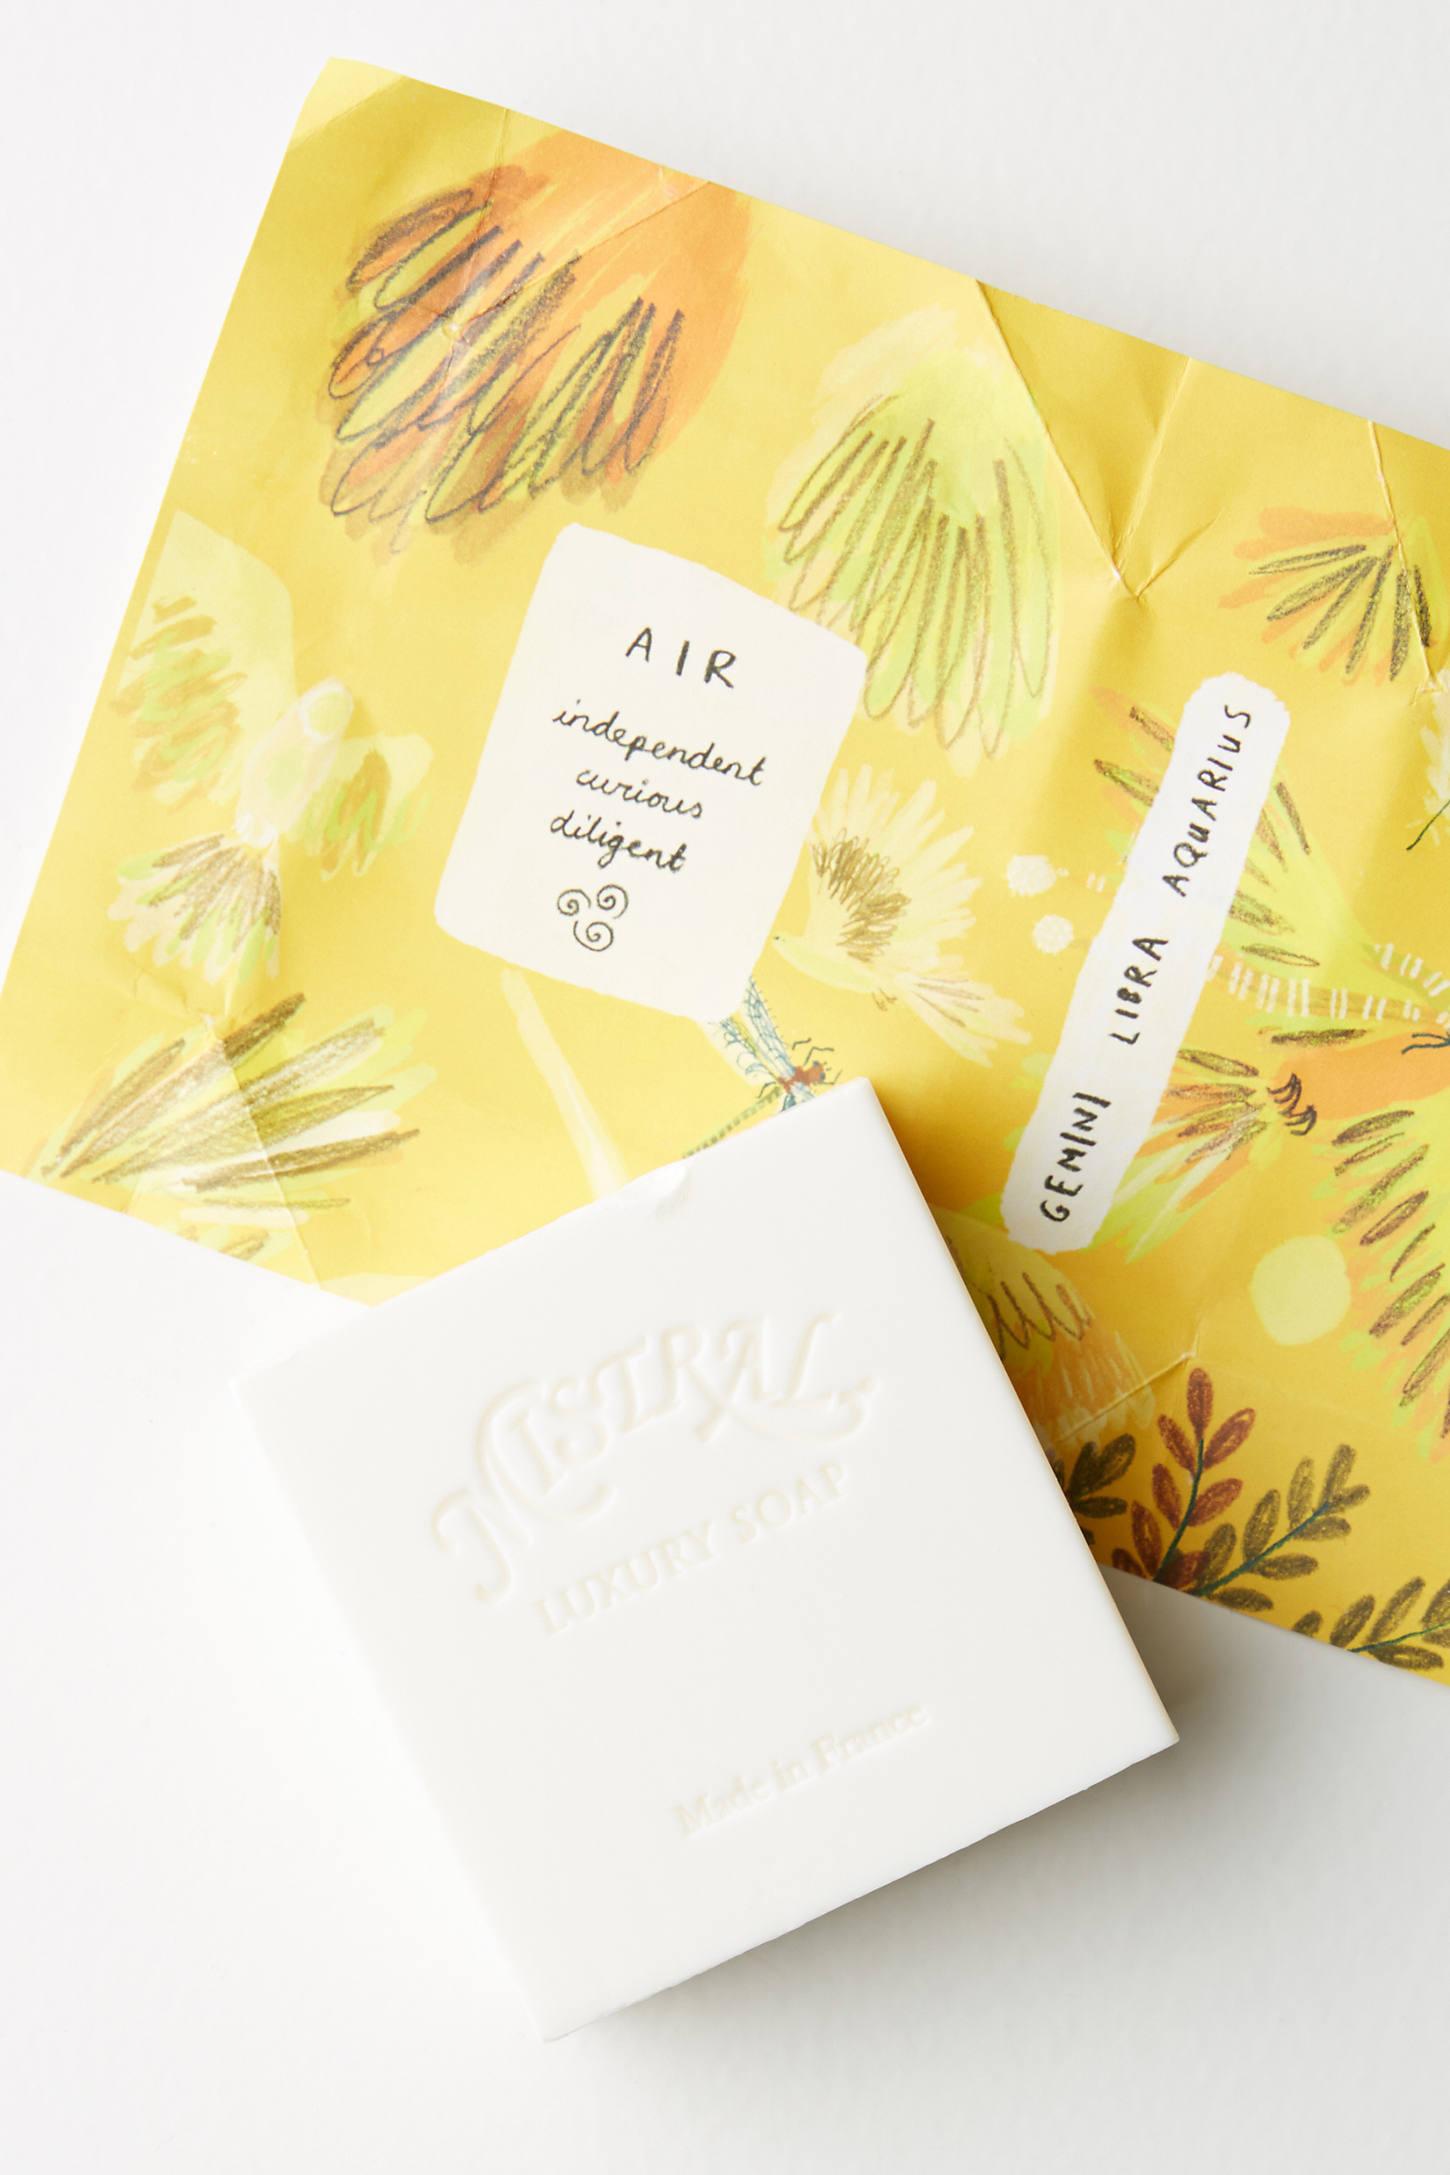 Mistral Artist Series Bar Soap